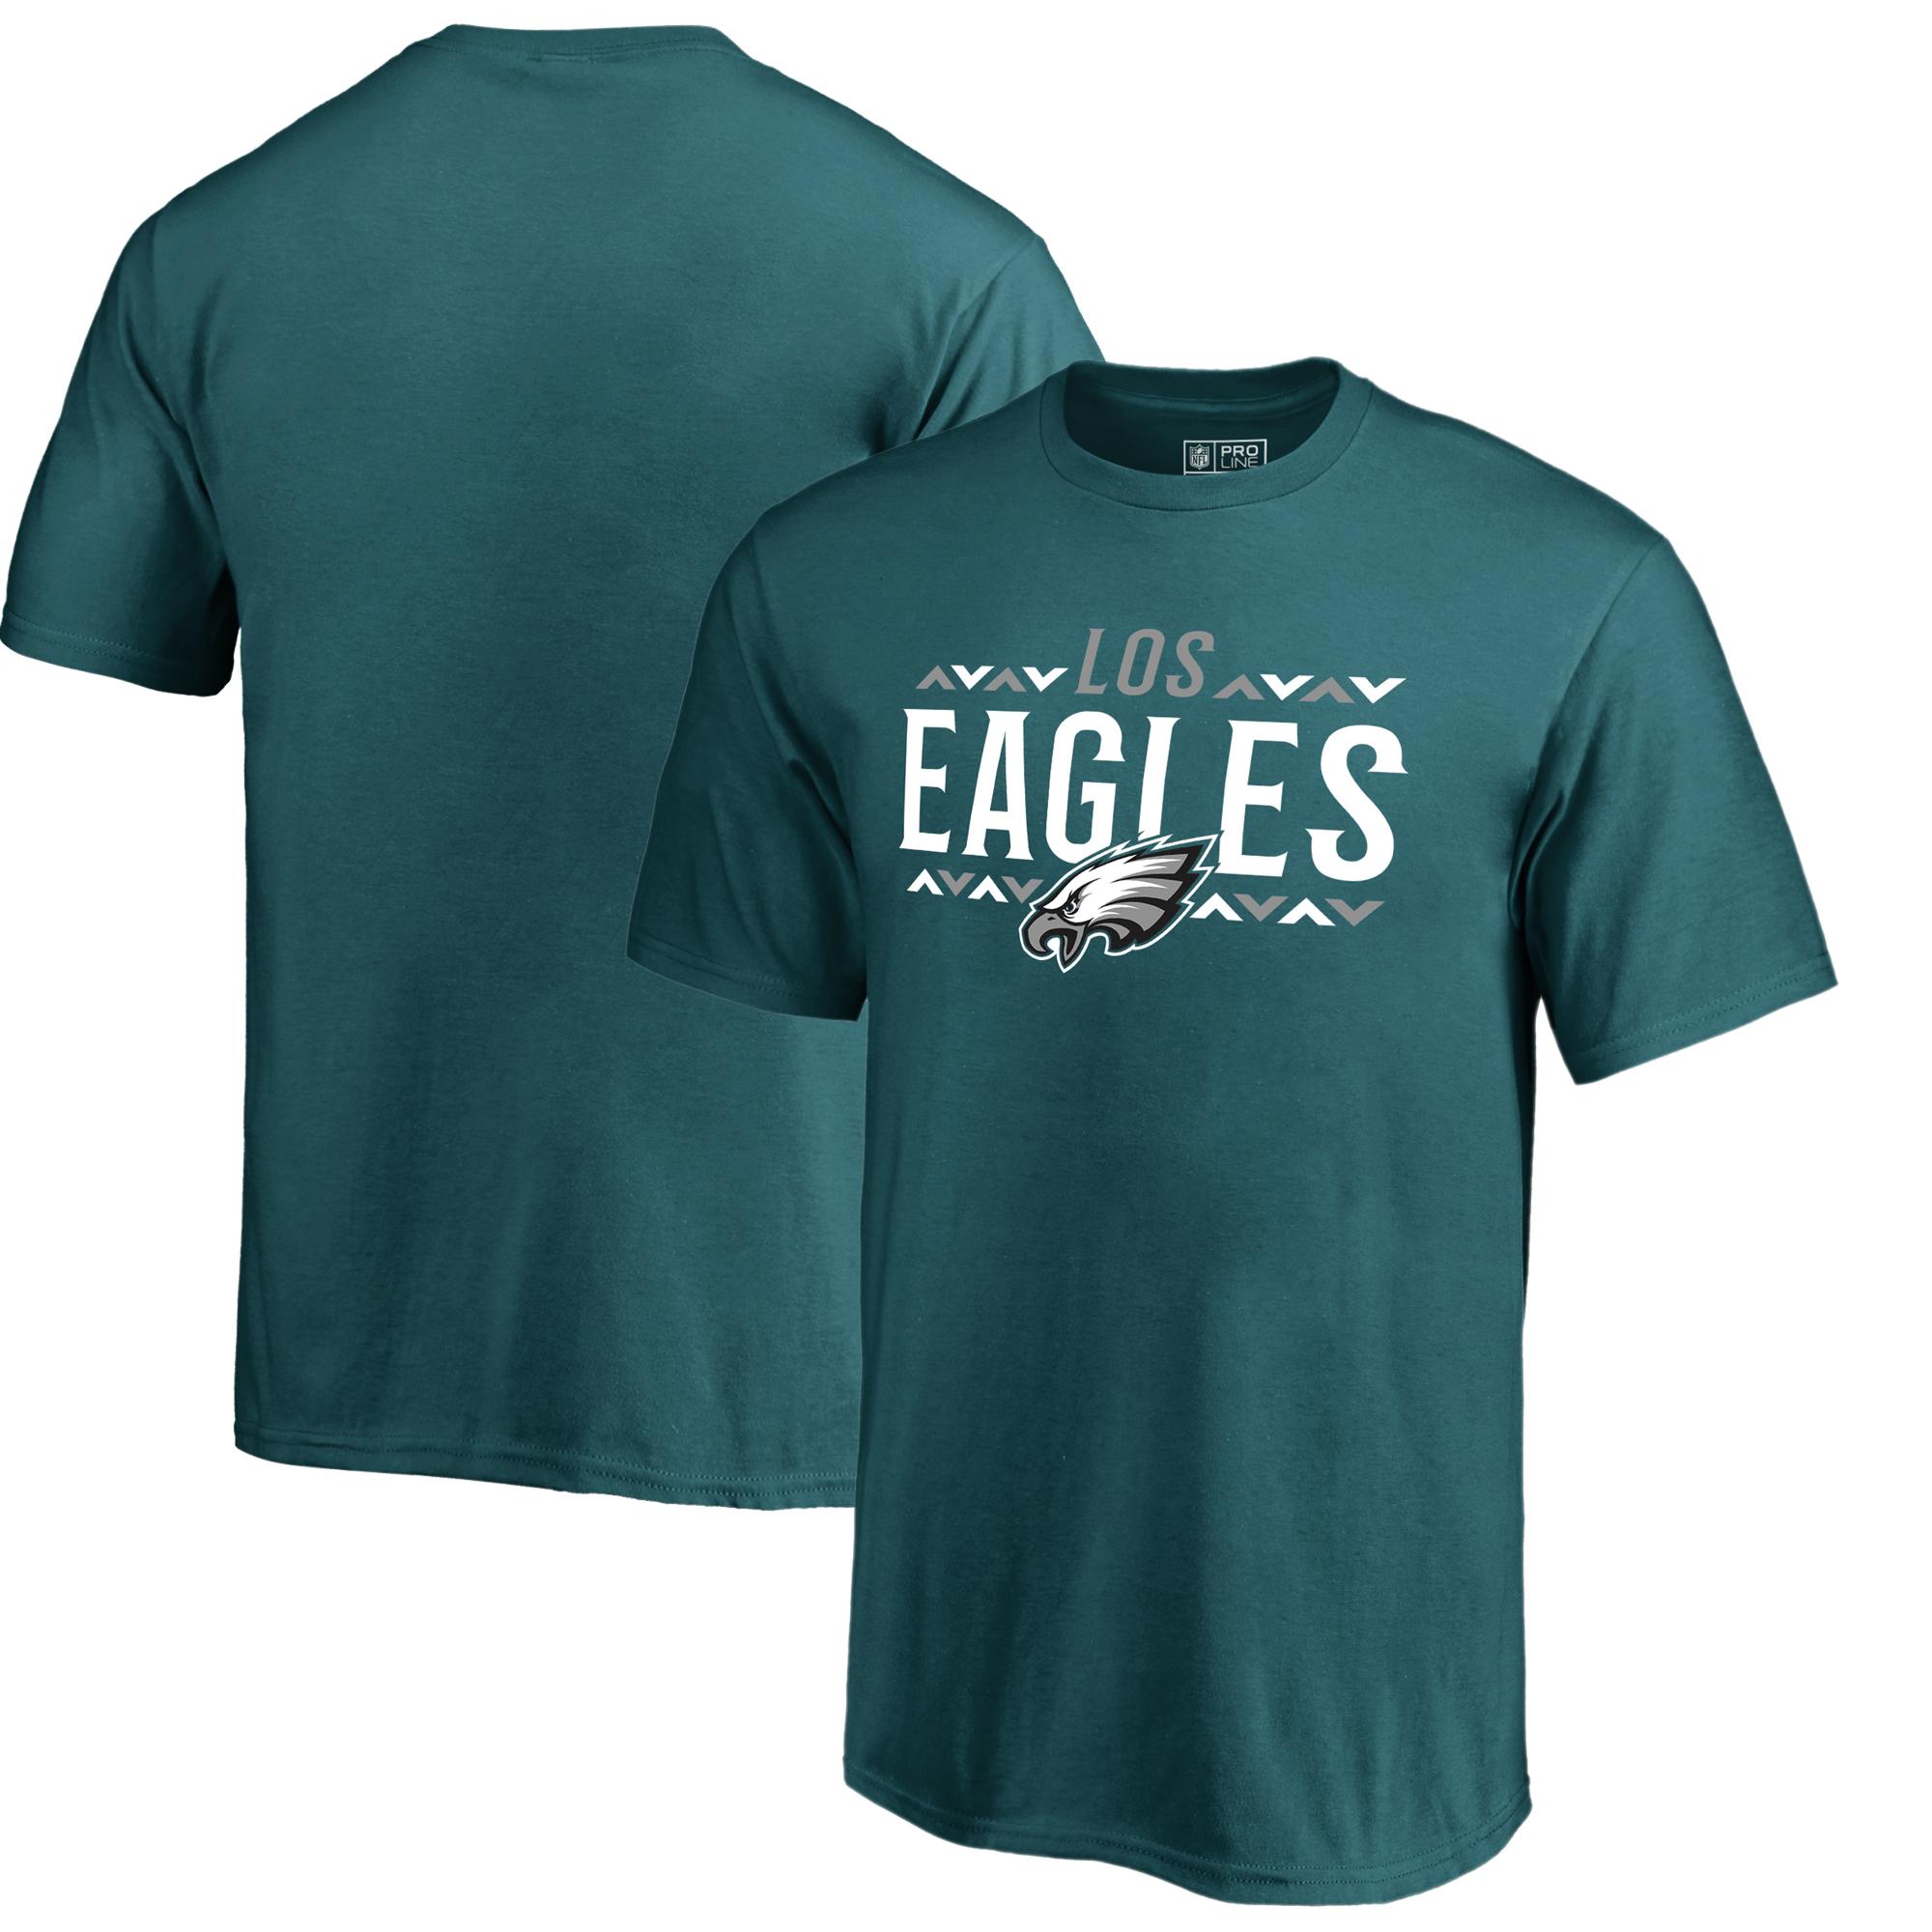 Philadelphia Eagles NFL Pro Line by Fanatics Branded Youth Arriba T-Shirt - Midnight Green